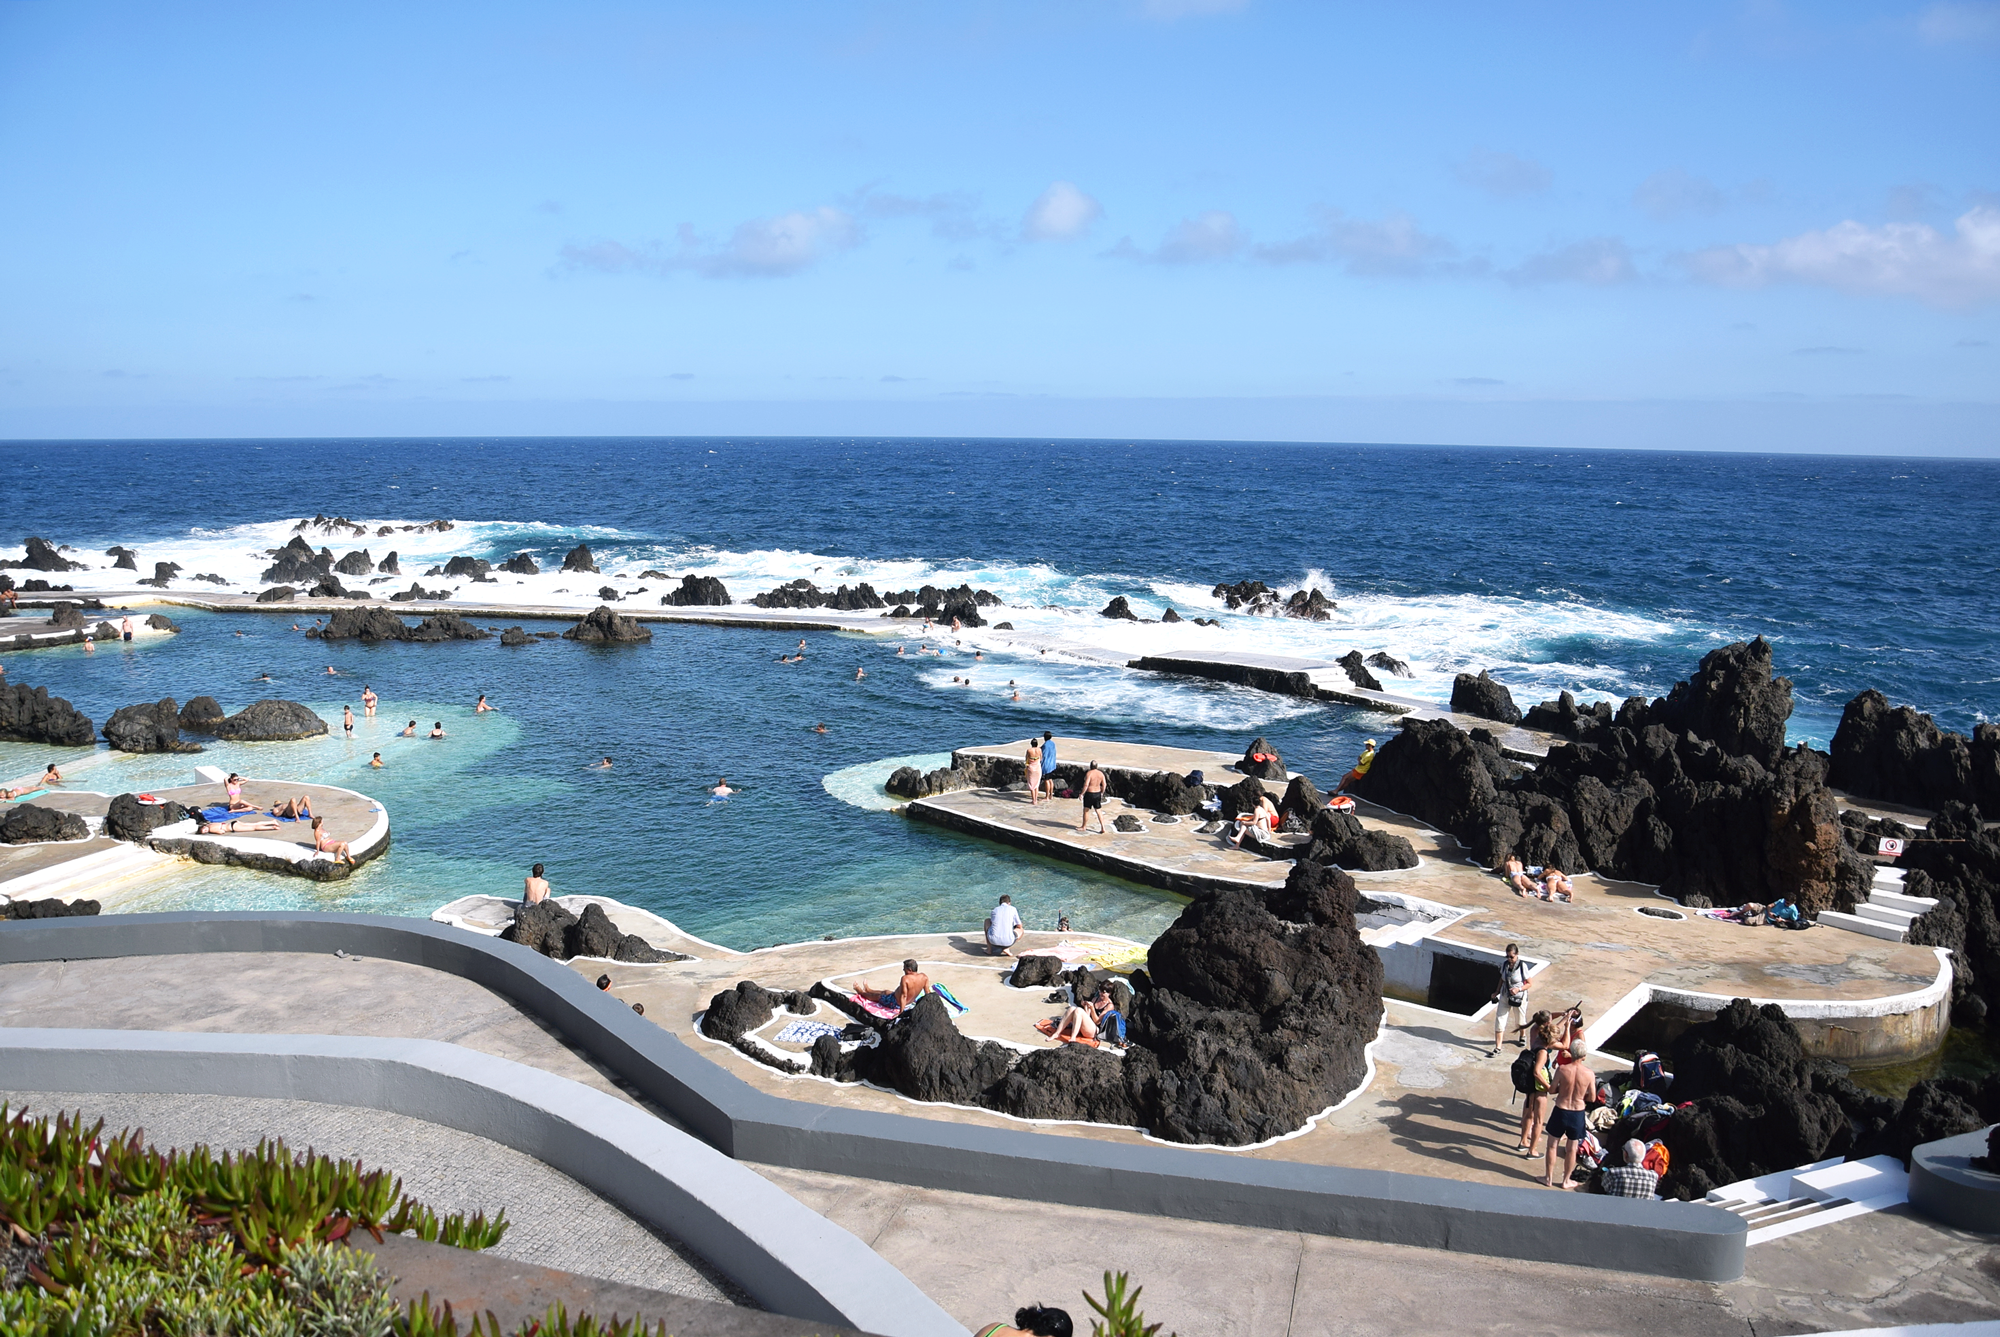 lawowe-baseny-porto-moniz